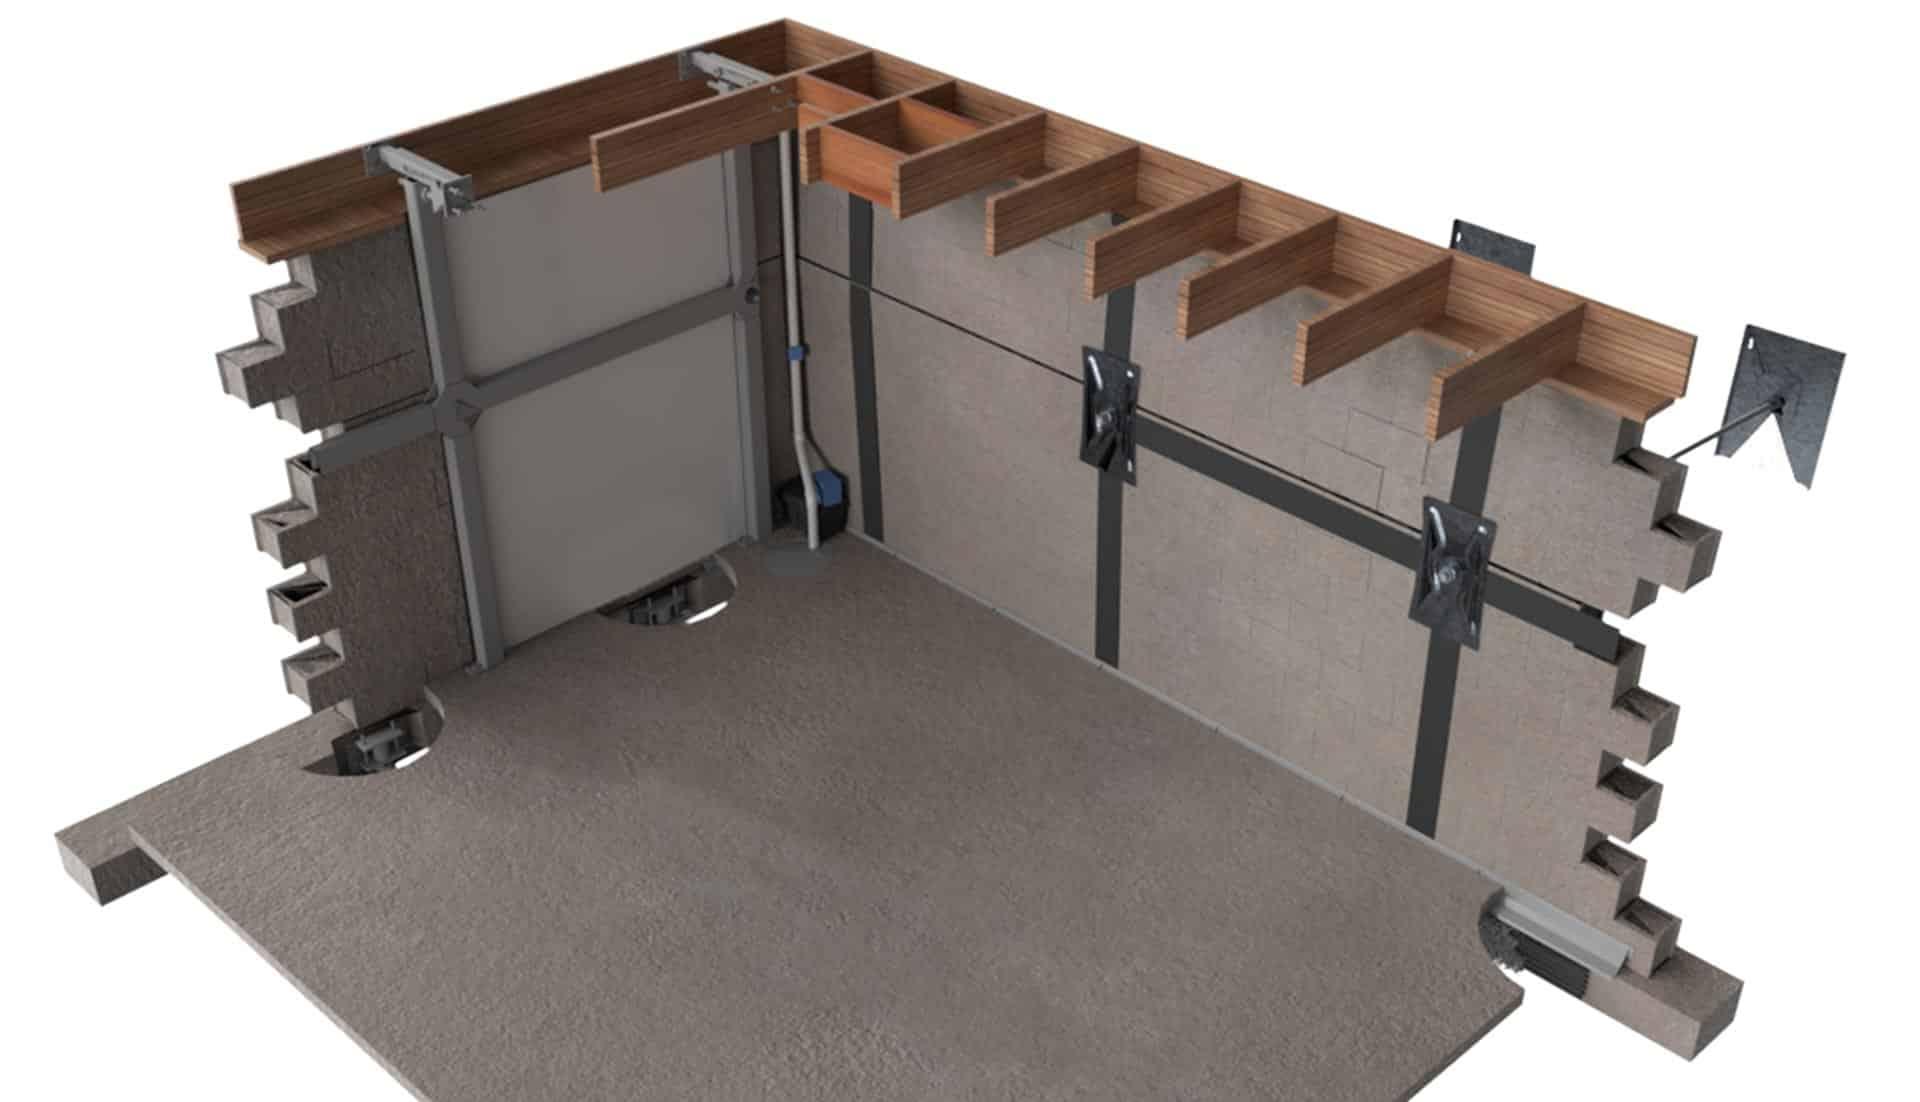 Tacoma Foundation & Concrete Repair: Basement Waterproofing